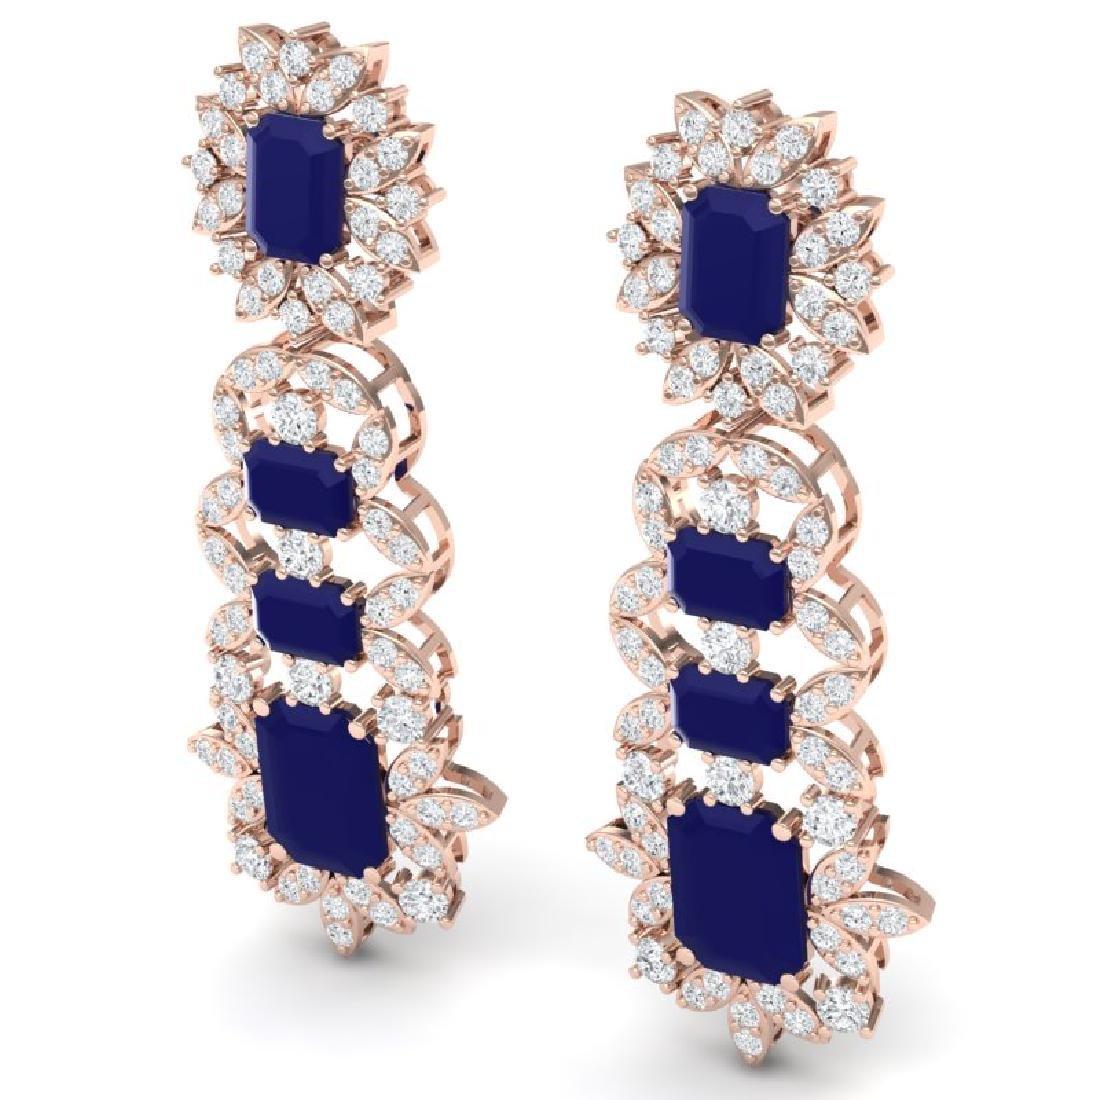 30.25 CTW Royalty Sapphire & VS Diamond Earrings 18K - 2